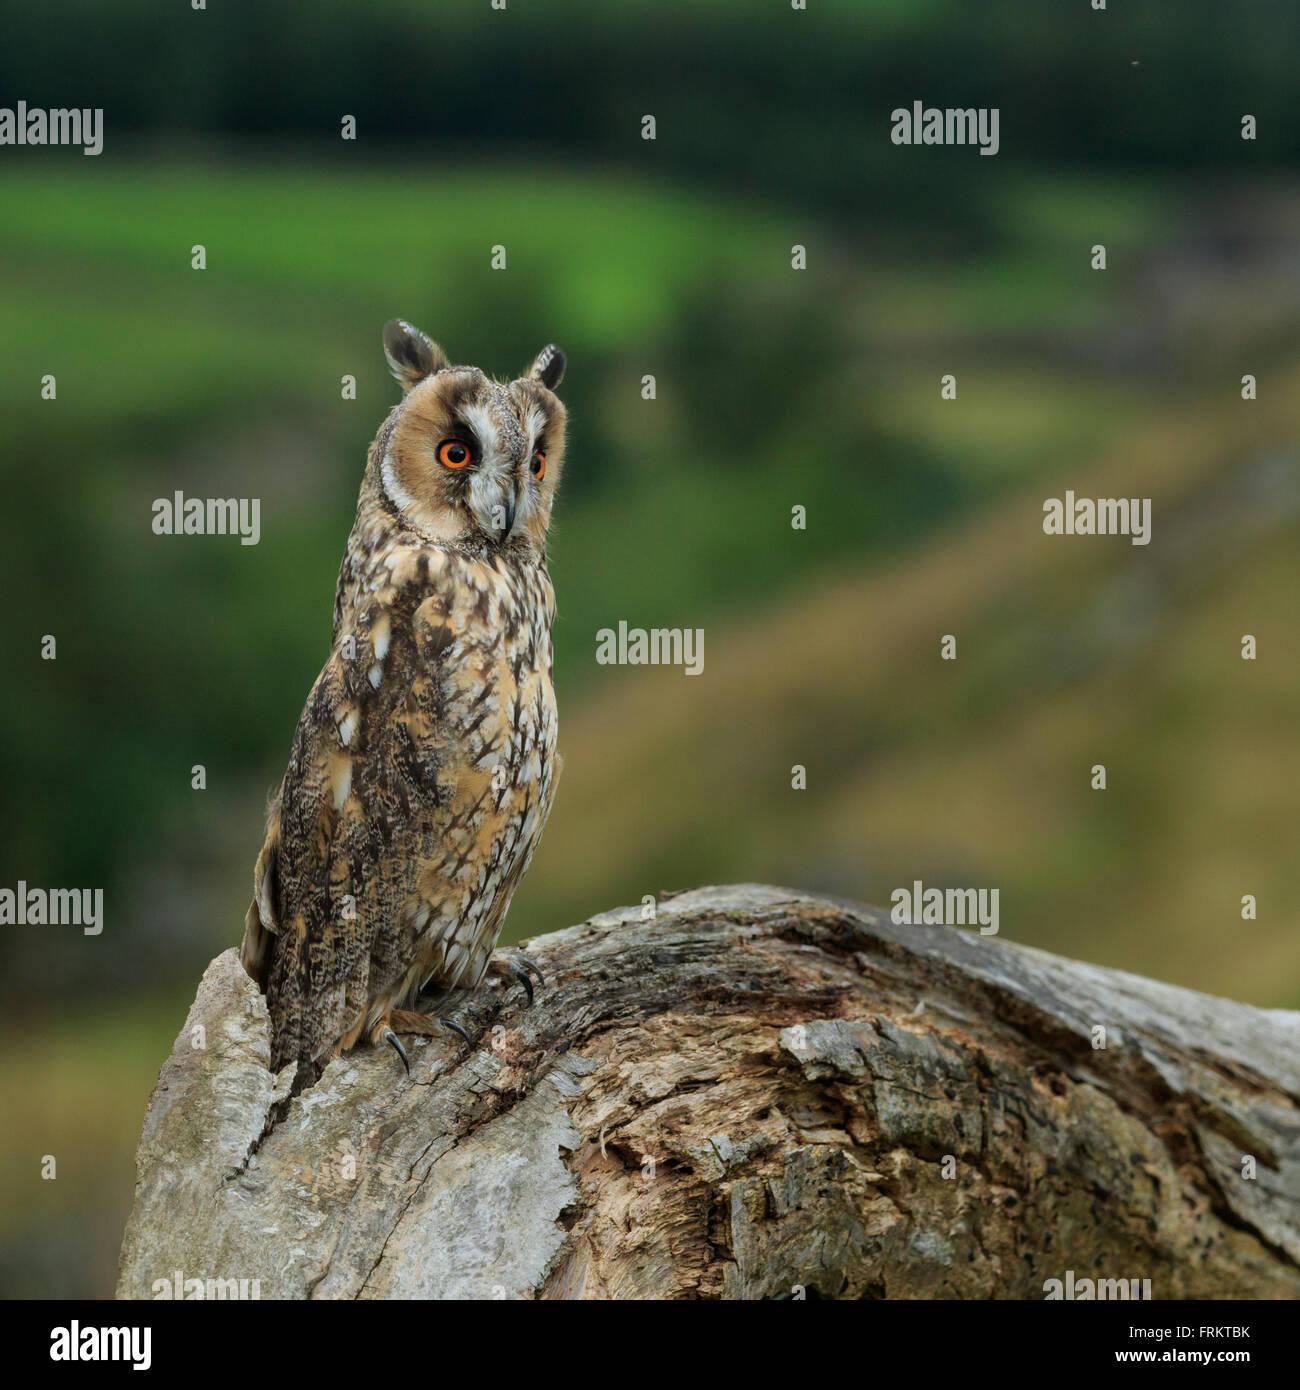 Long-eared owl (Asio otus) North Yorkshire, England, September, 2015 - Stock Image